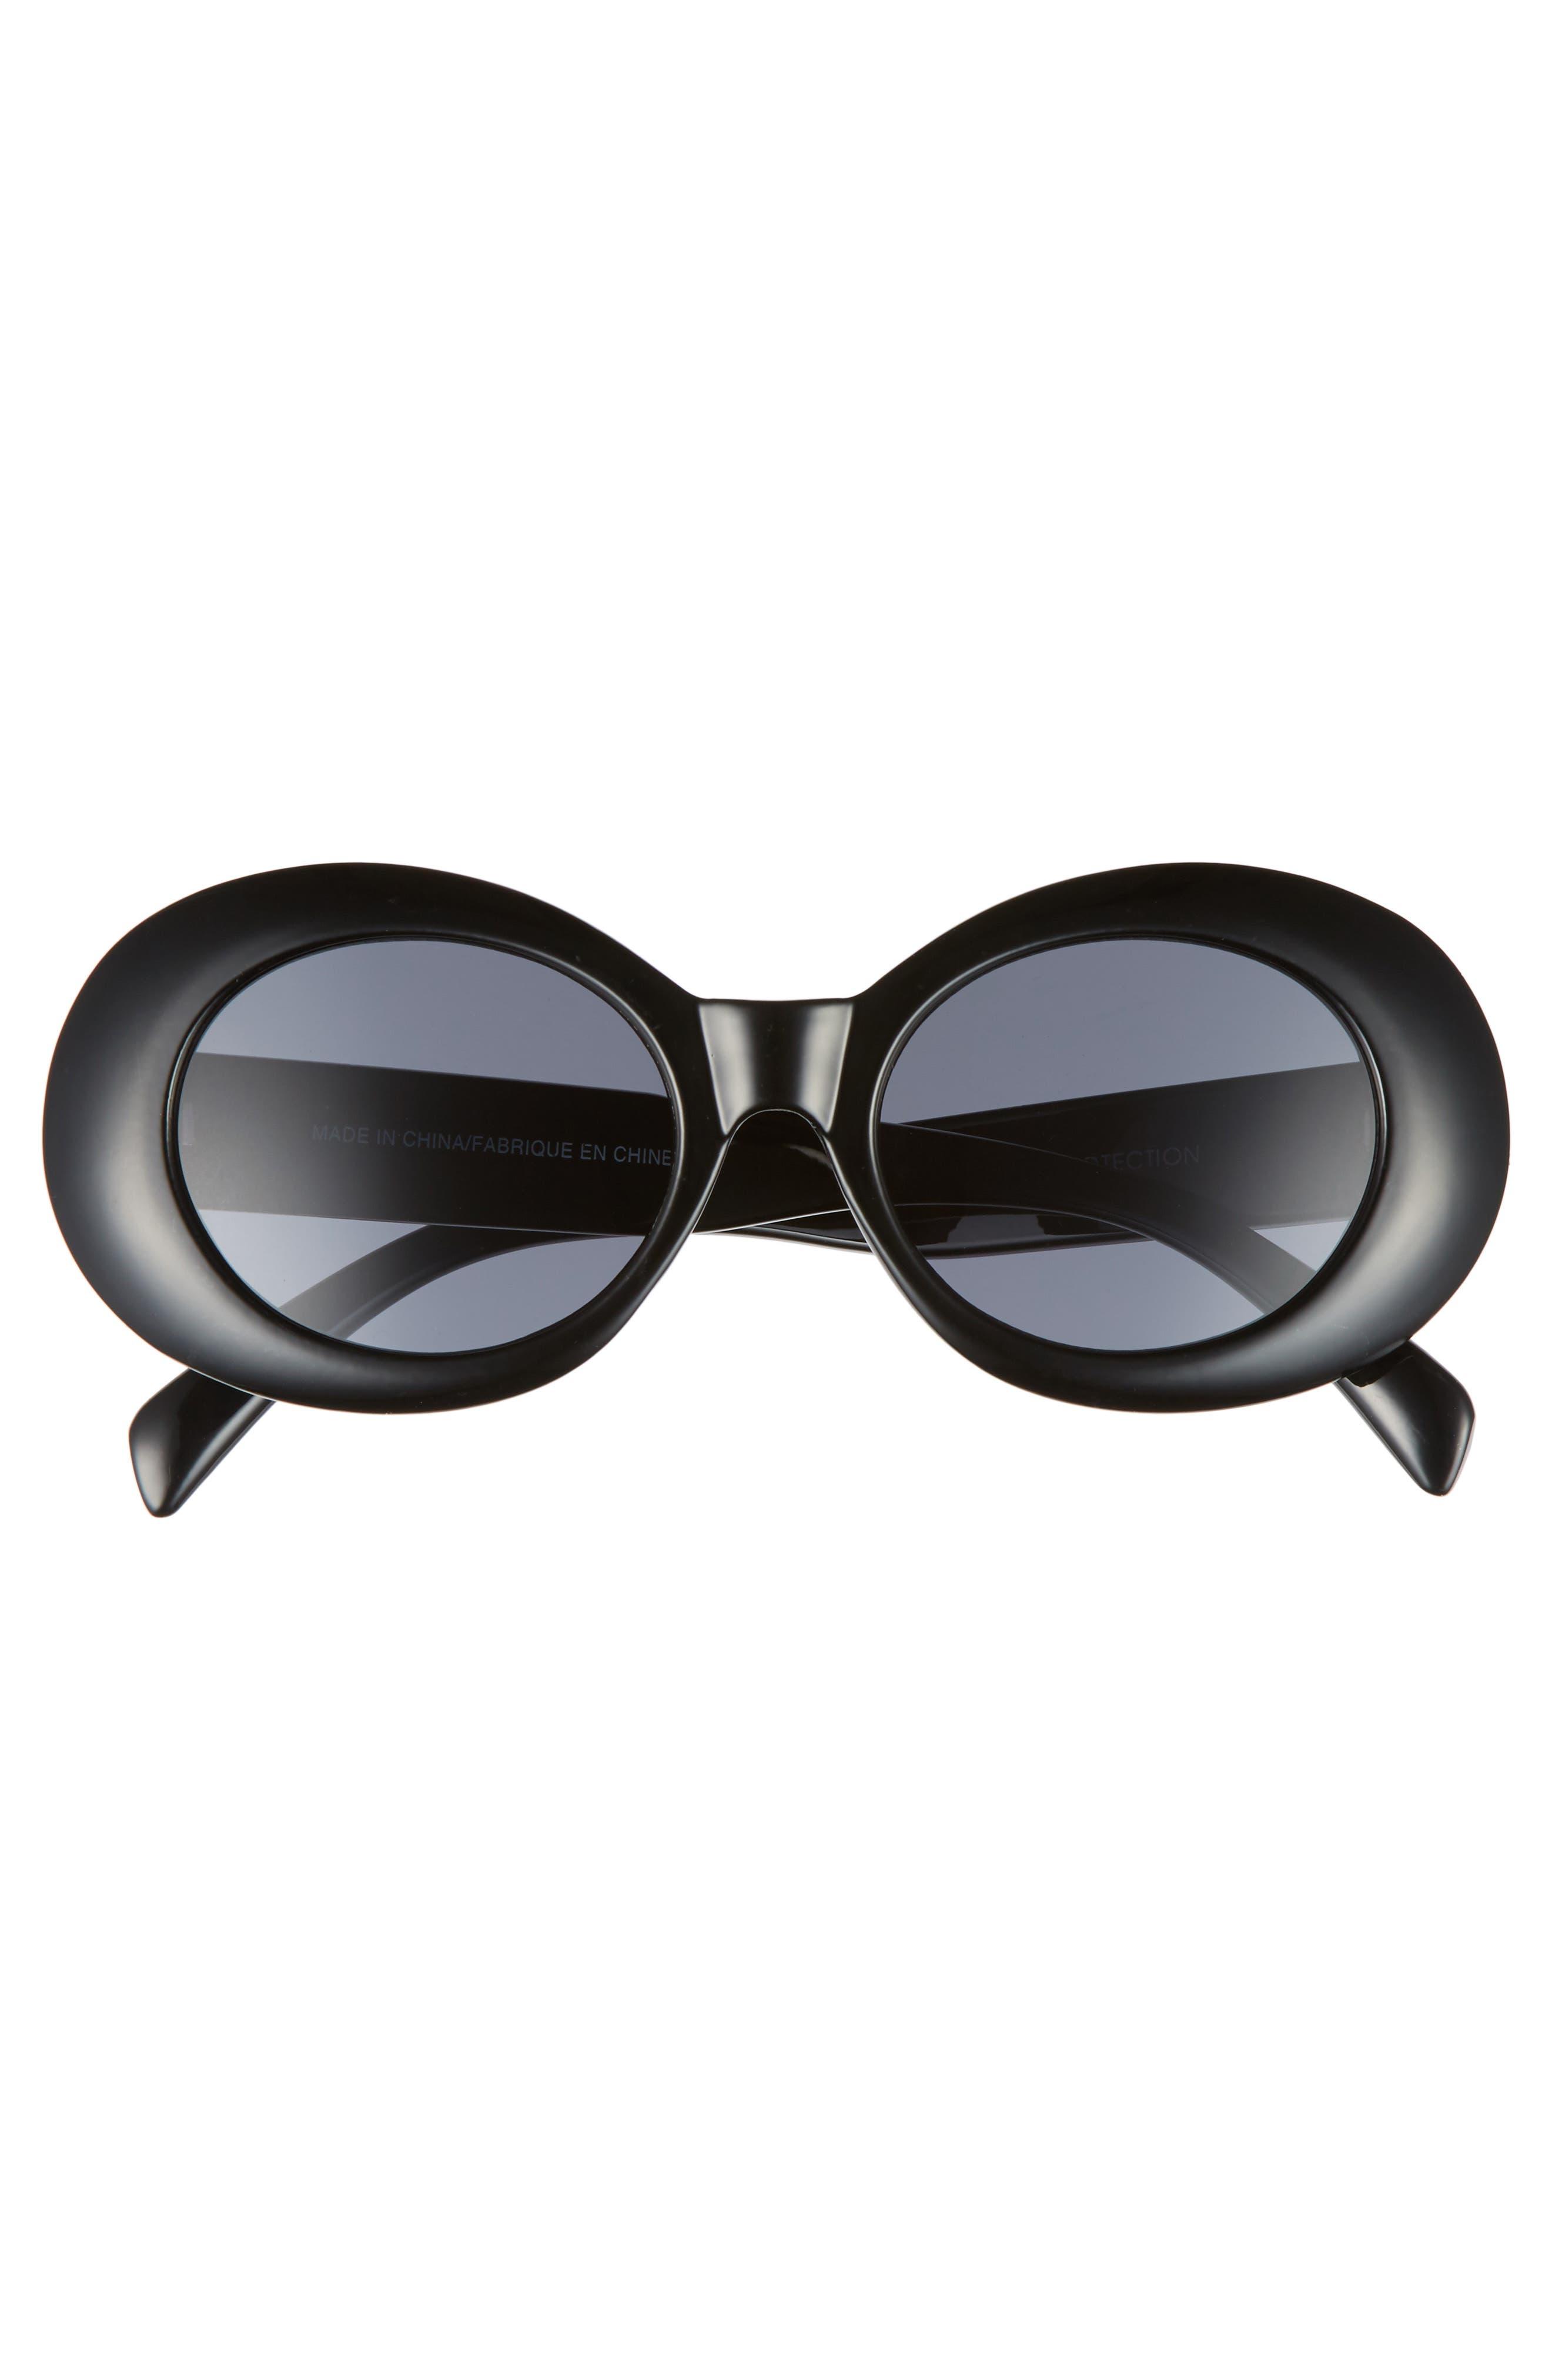 Oval Sunglasses,                             Alternate thumbnail 3, color,                             001